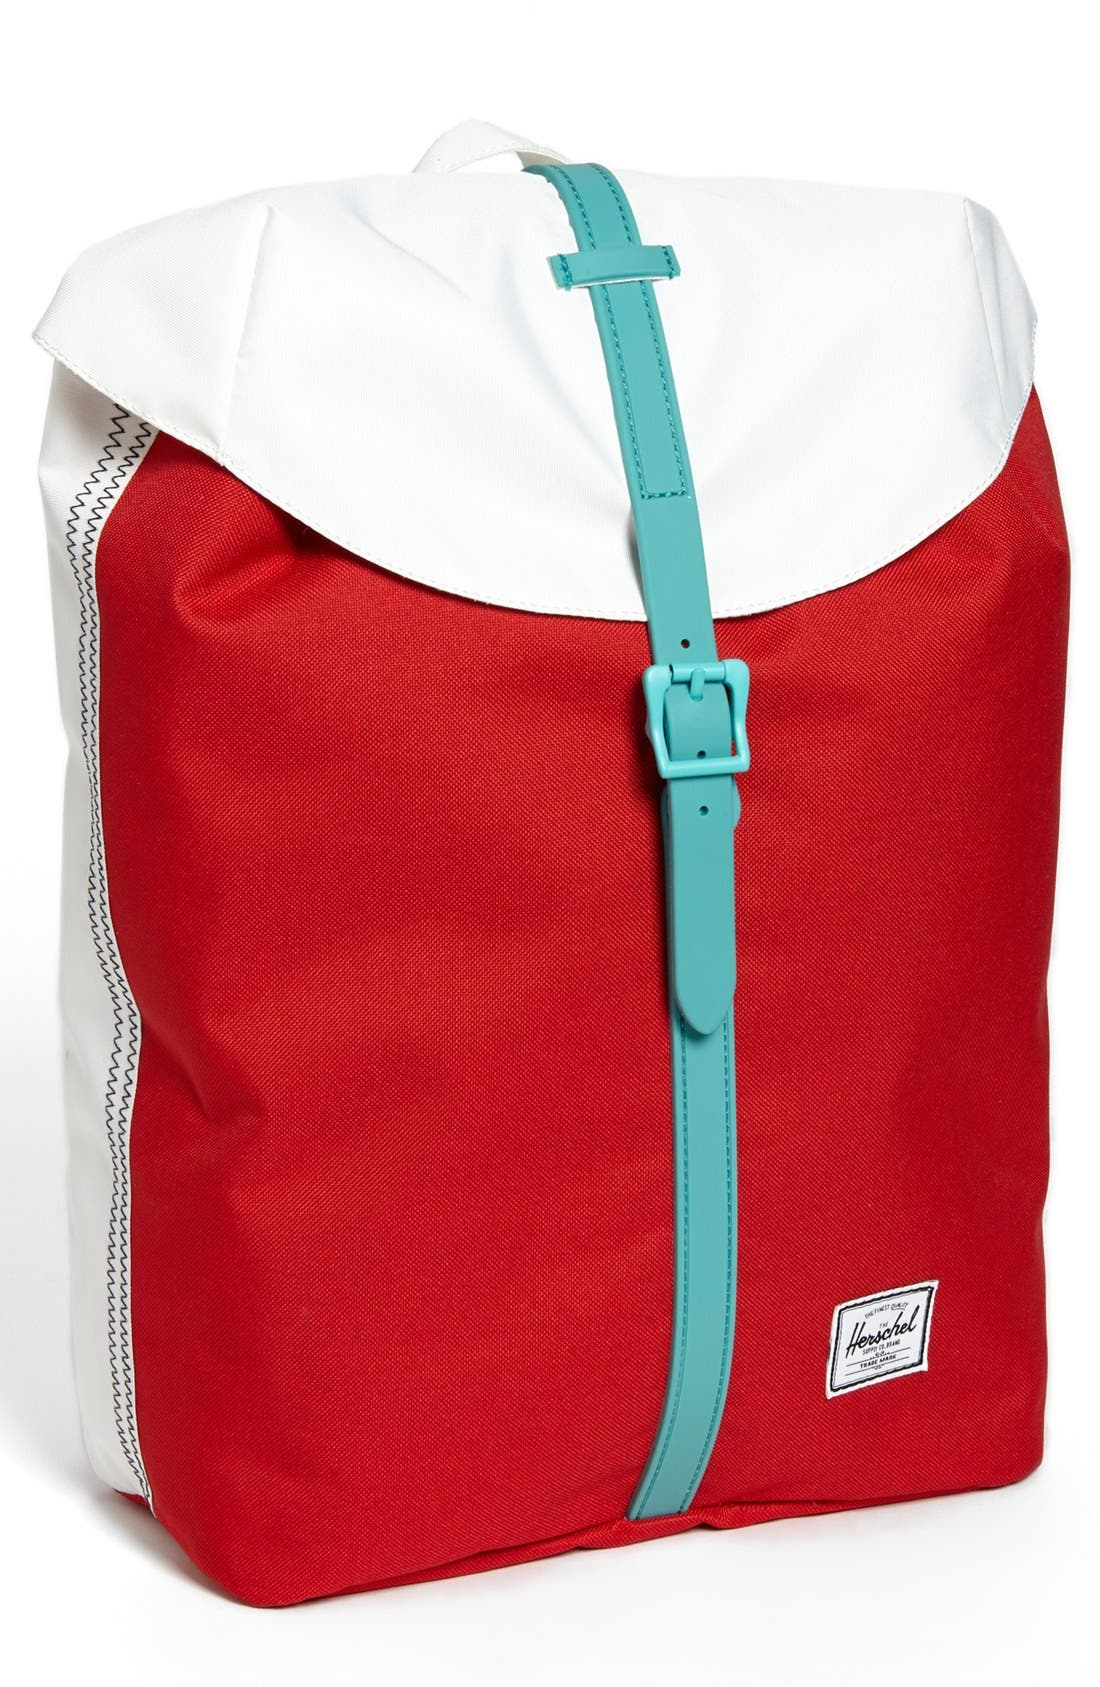 Main Image - Herschel Supply Co. 'Post - Studio Collection' Backpack